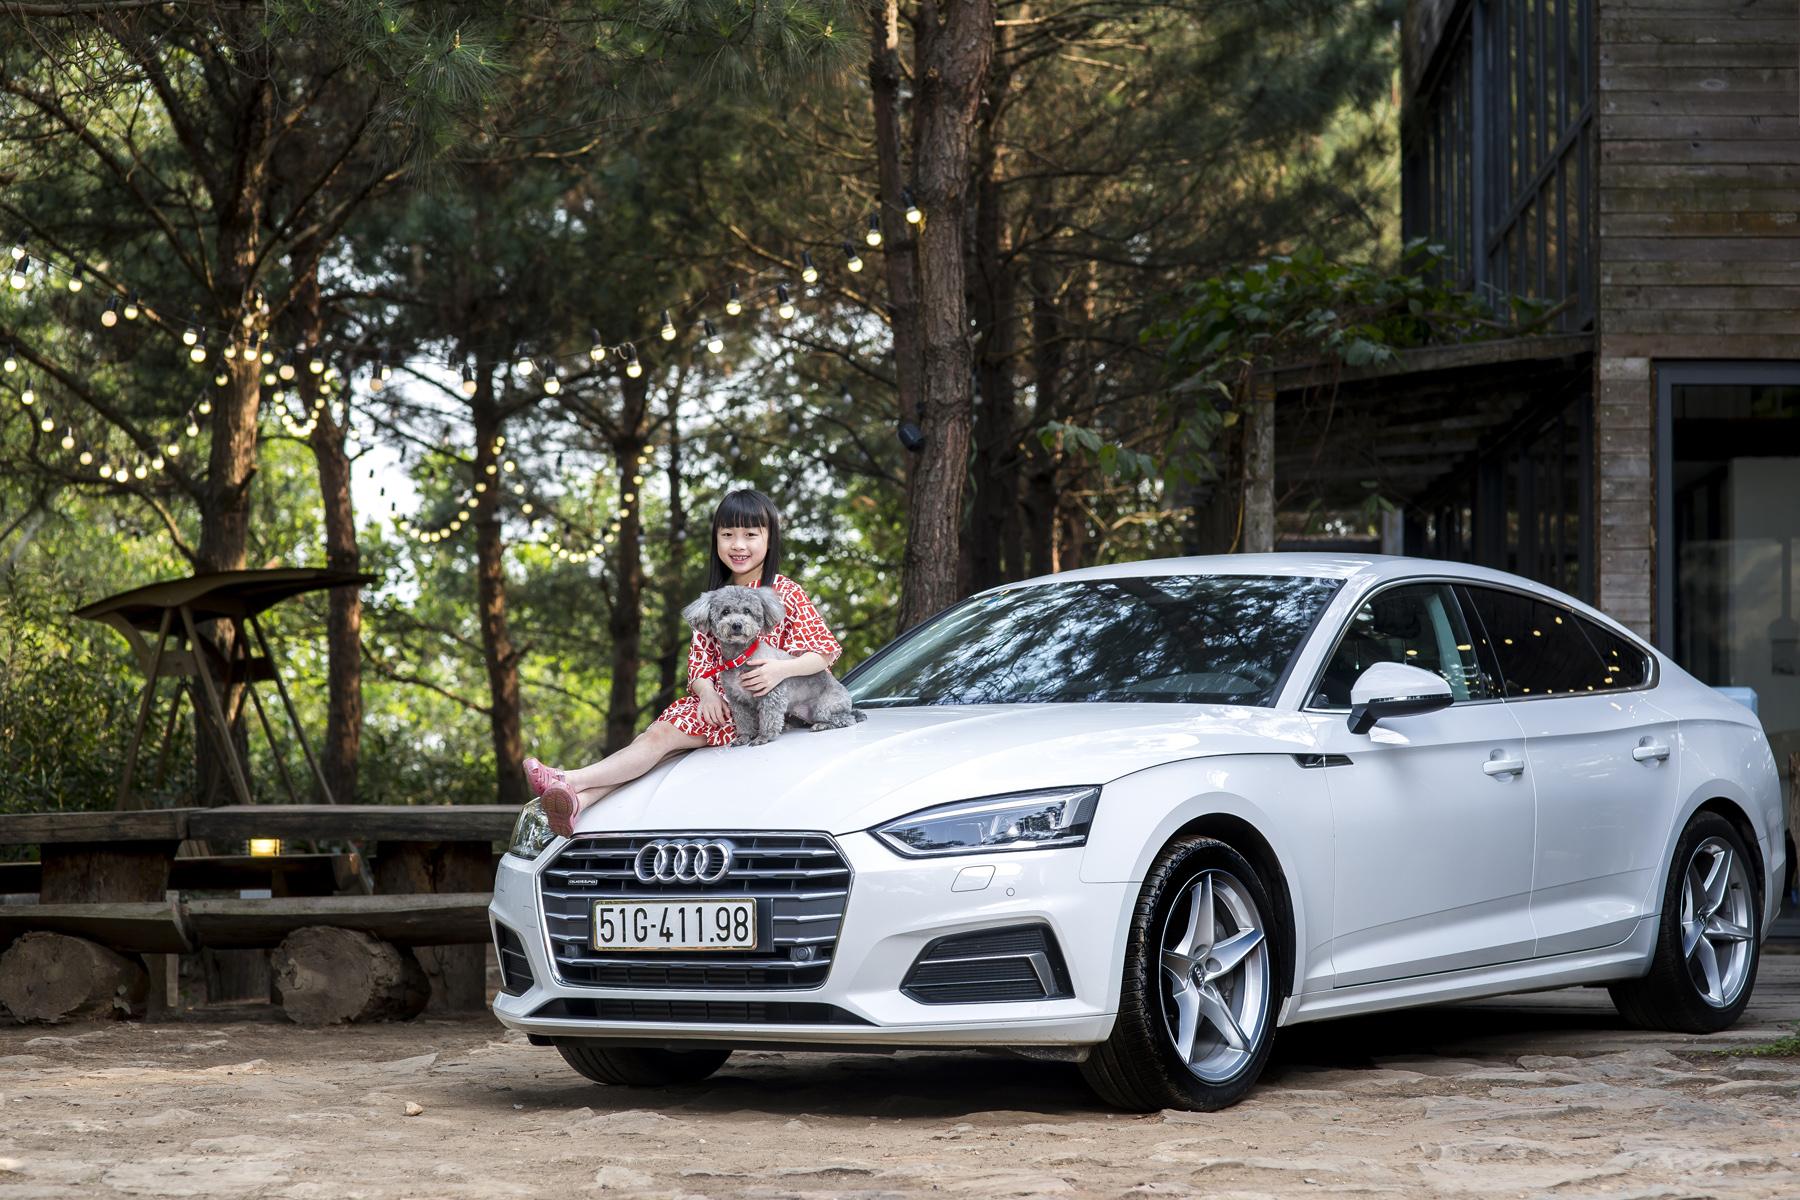 Audi-A5-Sportback-moi-tai-Viet-Nam-An-xang-it-hon-ma-manh-hon-anh-3